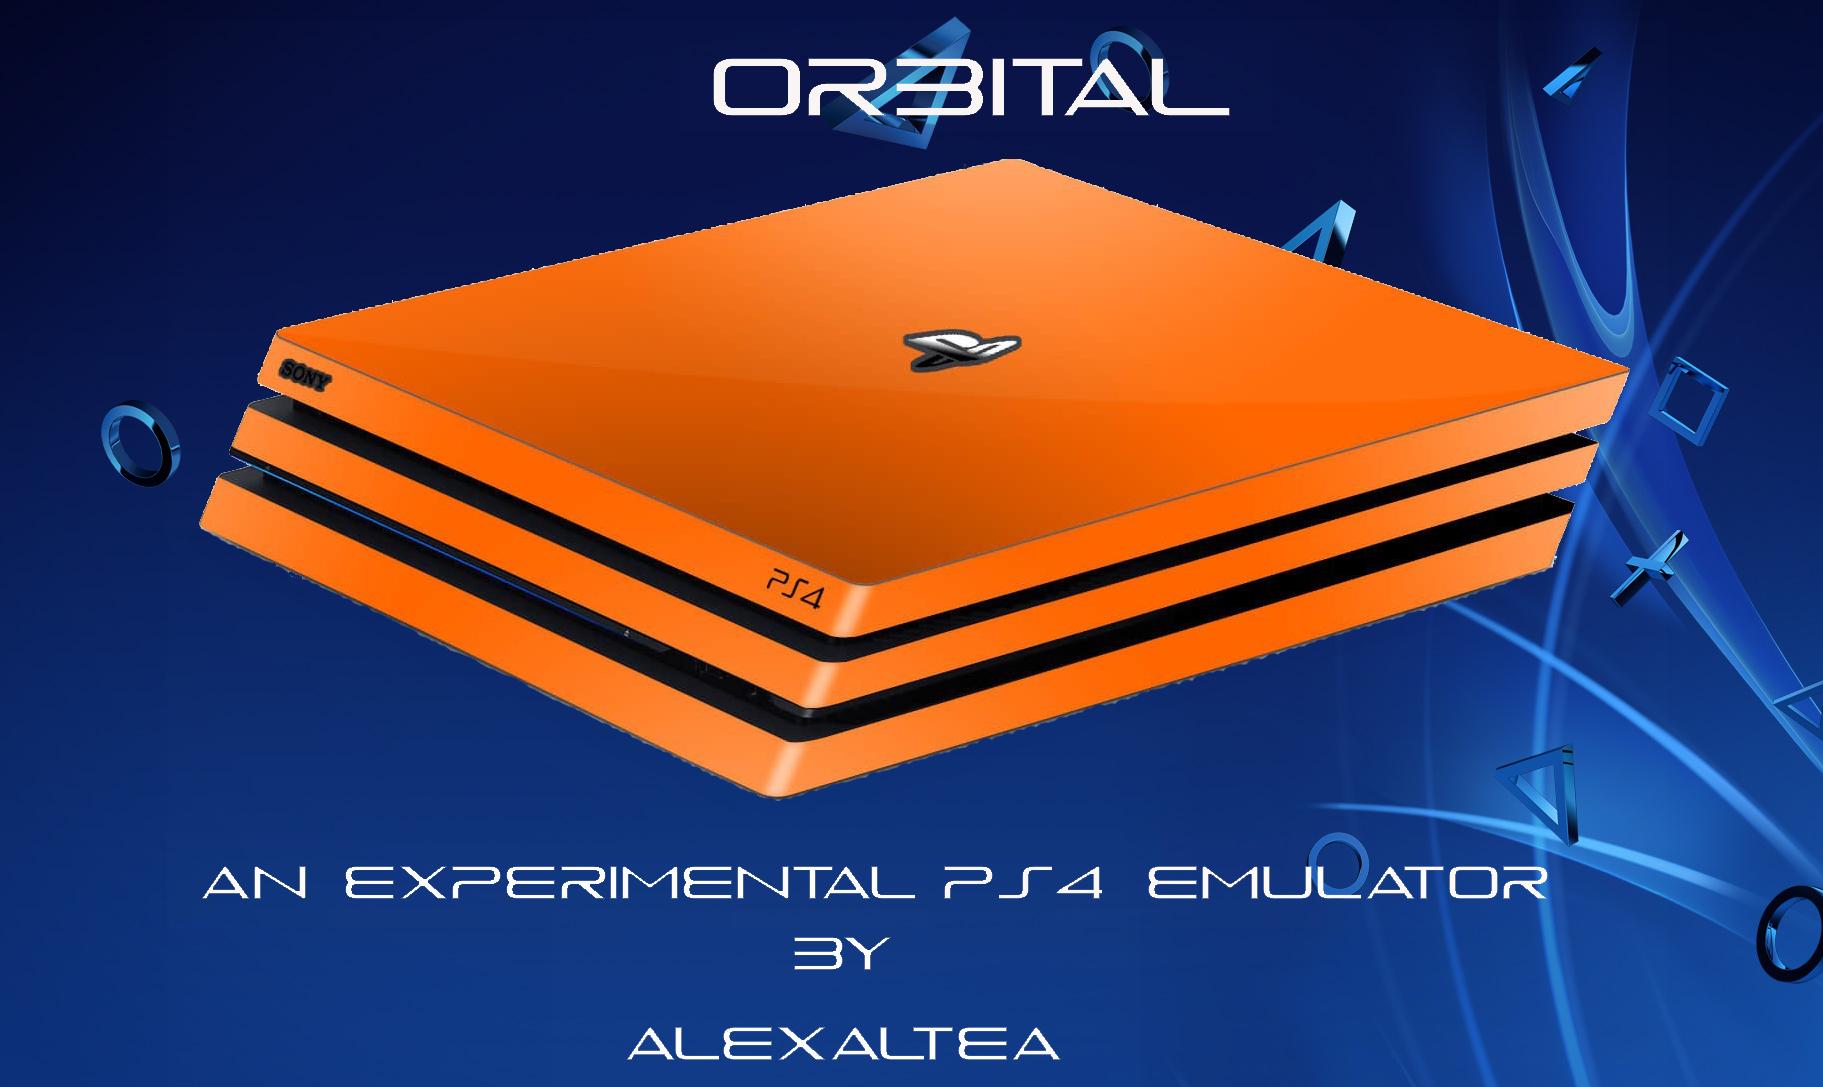 Orbital2.png